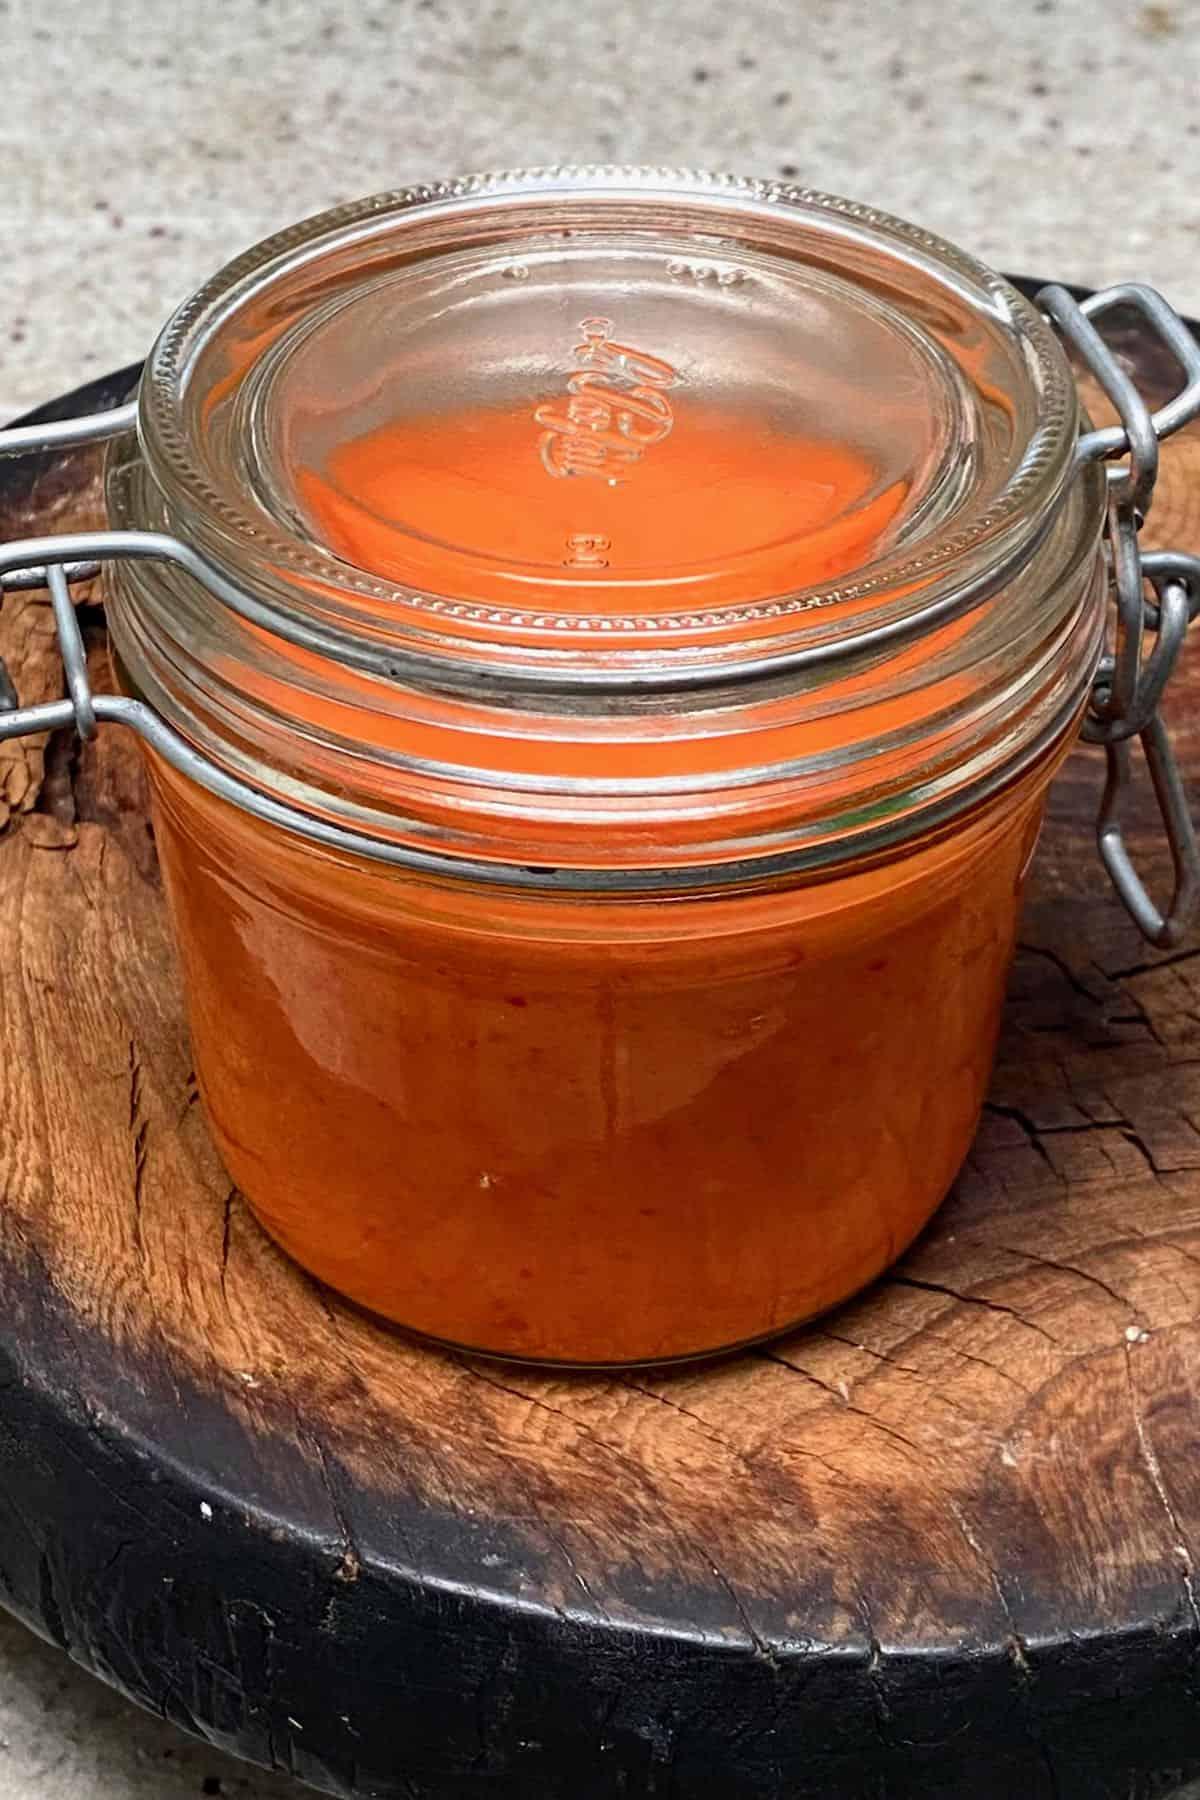 A jar with homemade chili sauce